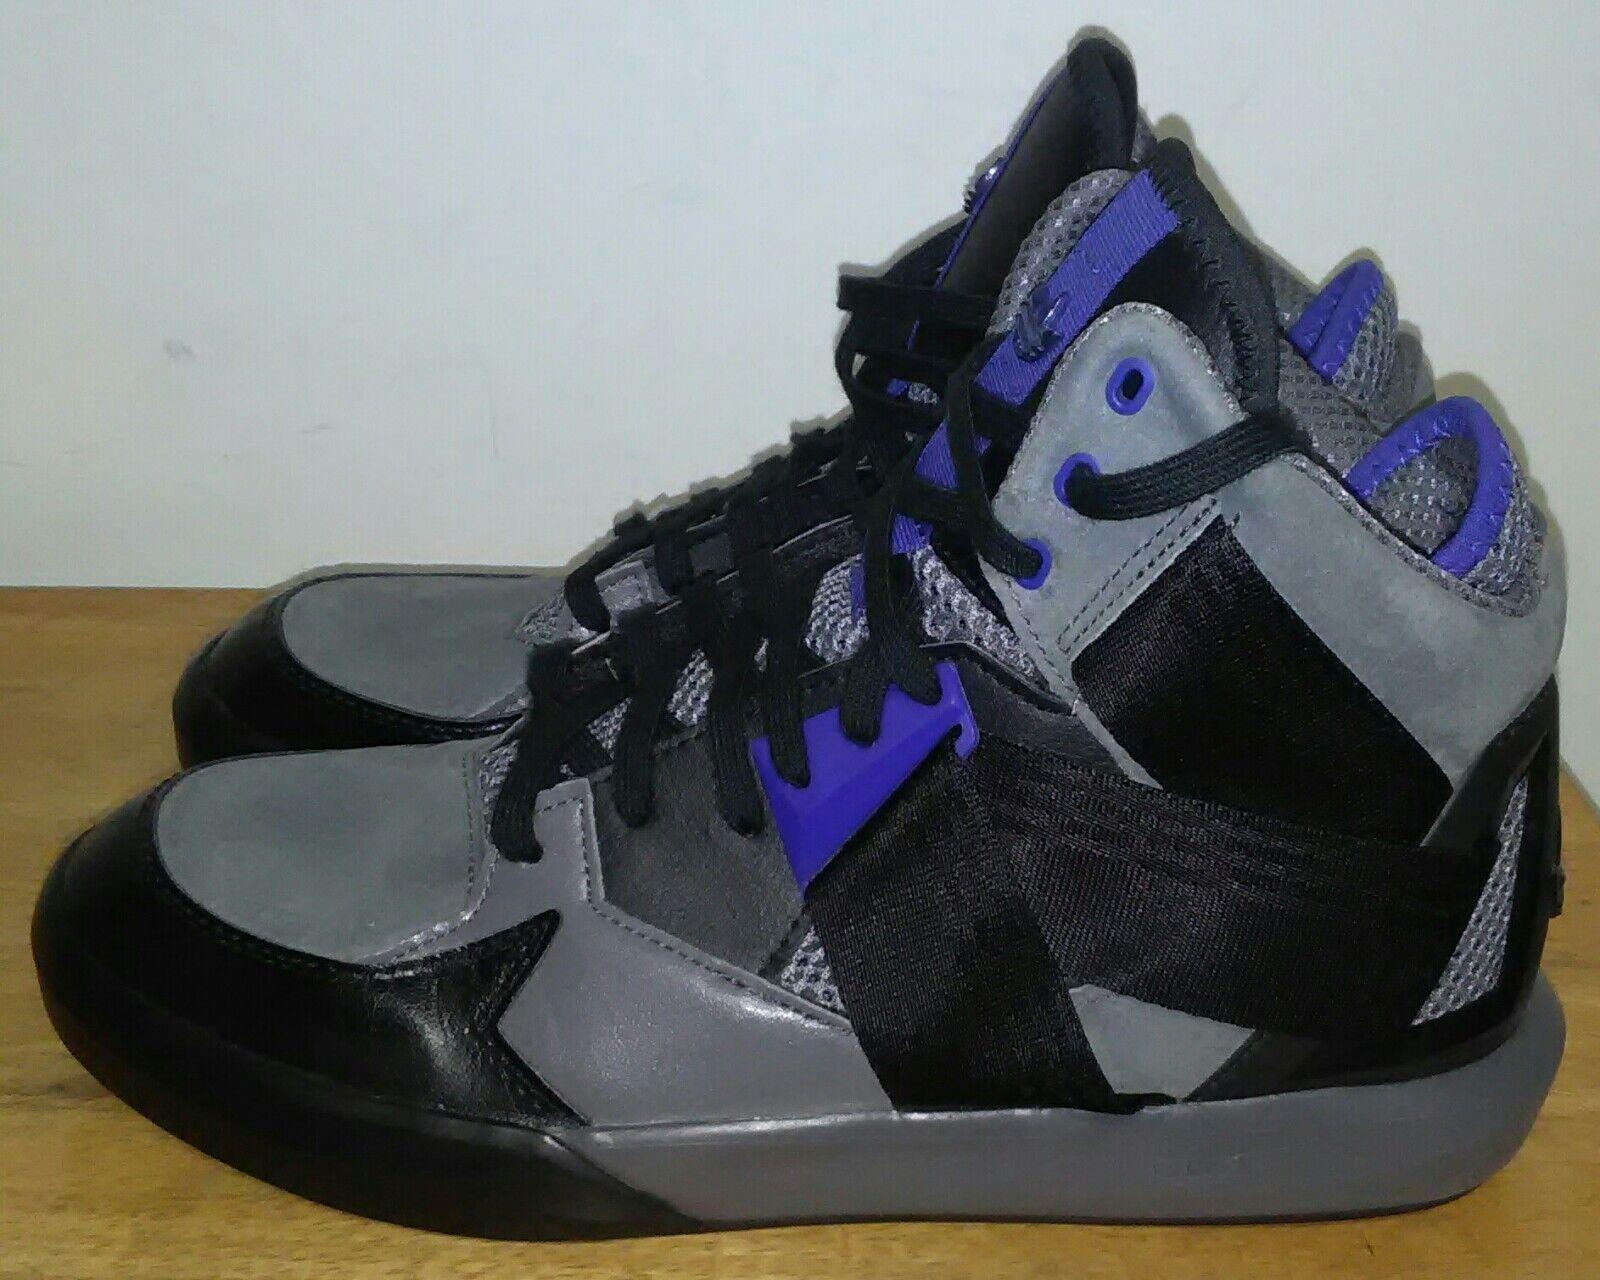 Adidas Emv 004001 Hi Tops Tops Tops Leather Classic Sneaker